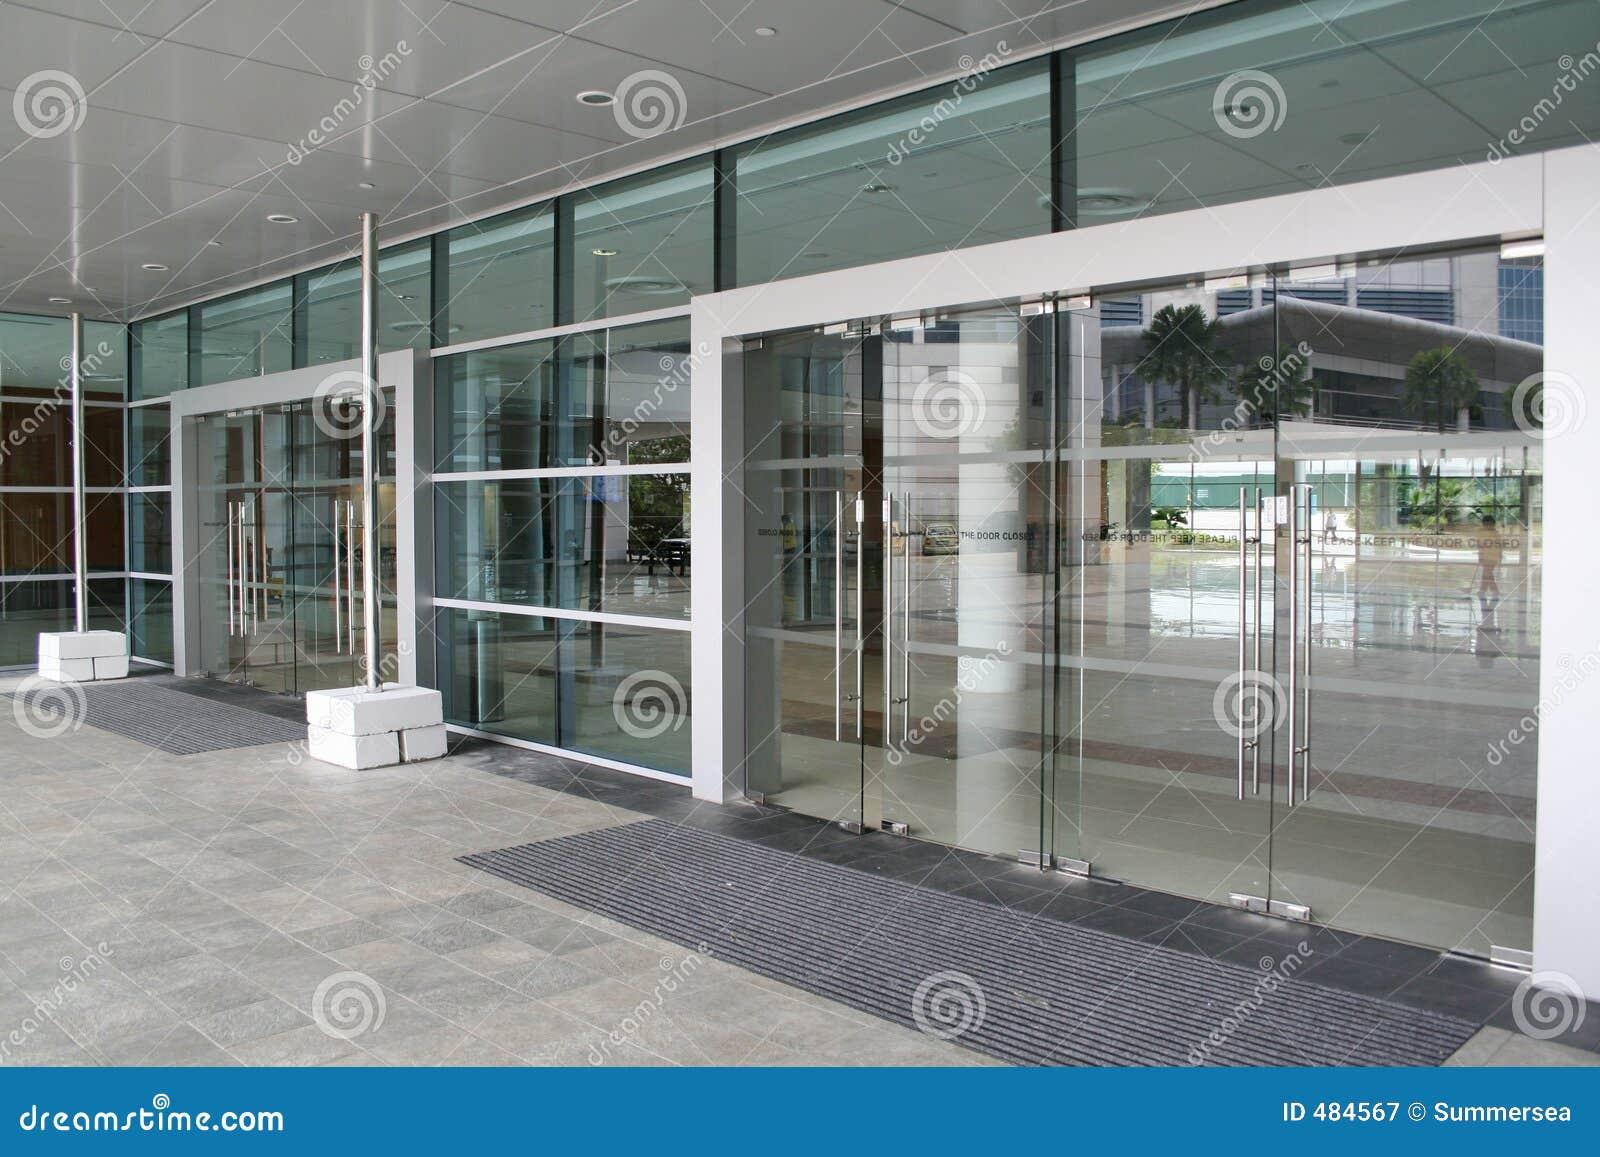 Puertas de cristal fotograf a de archivo libre de regal as - Puertas deslizantes de cristal ...